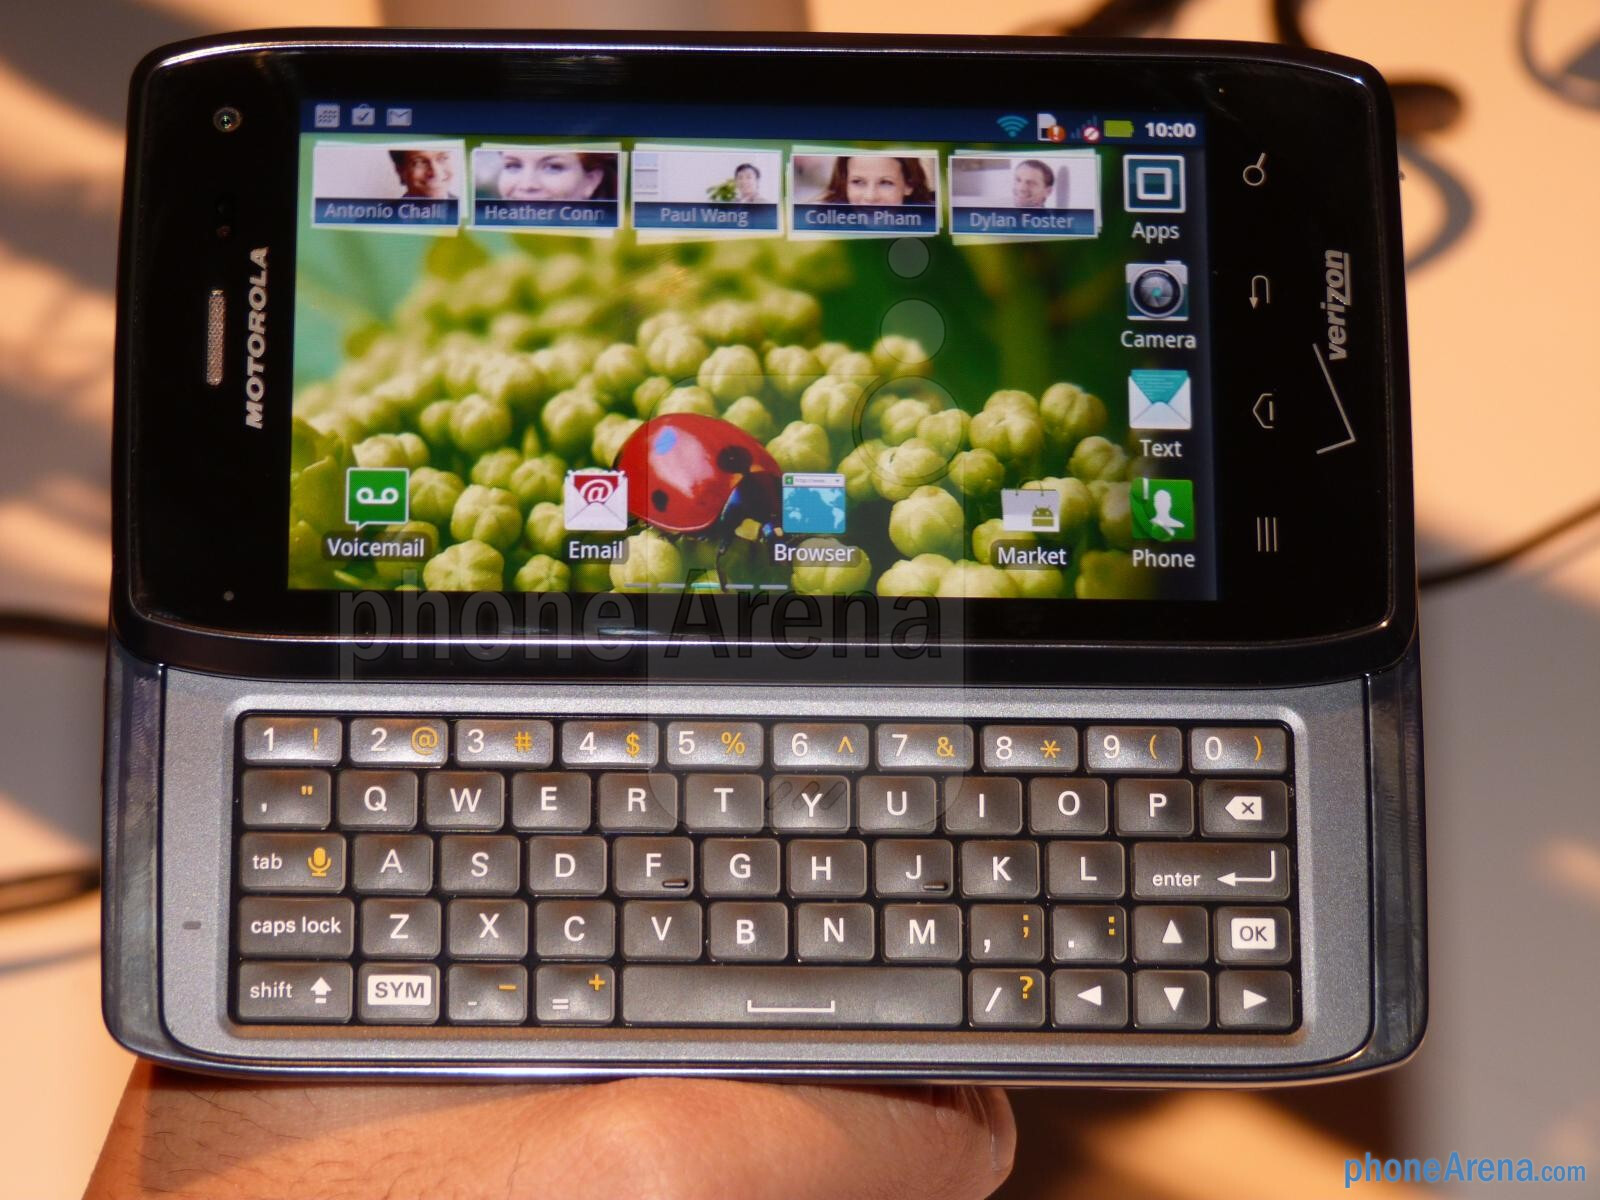 Motorola DROID 4 hands-on | PhoneArena reviews - PhoneArena